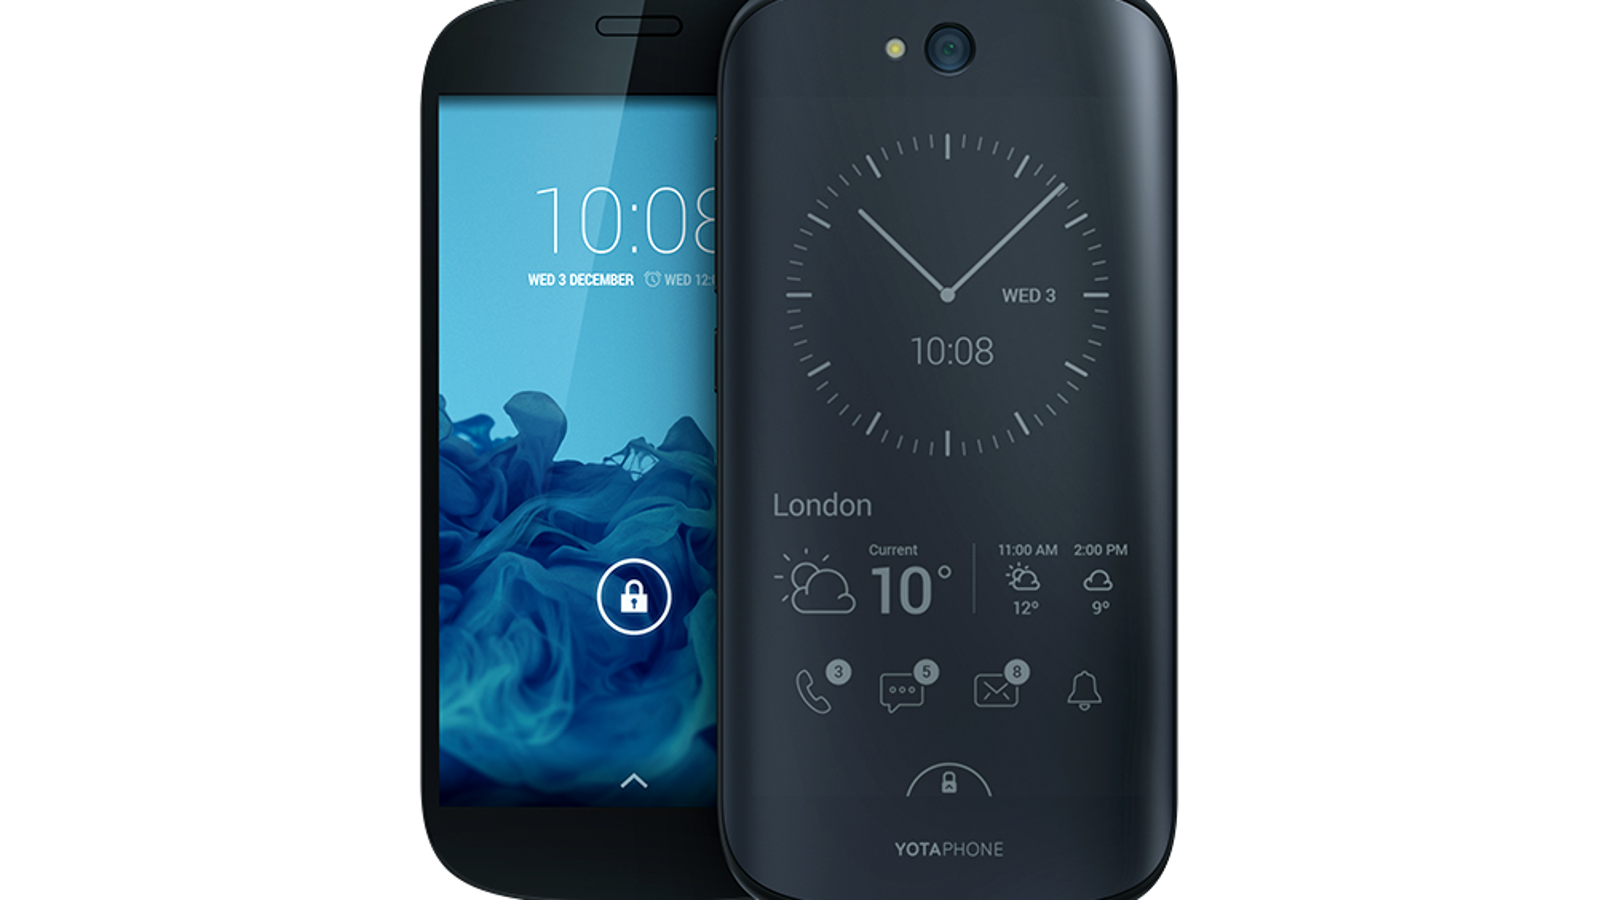 El smartphone de doble pantalla Yotaphone 2, ya a la venta en Europa